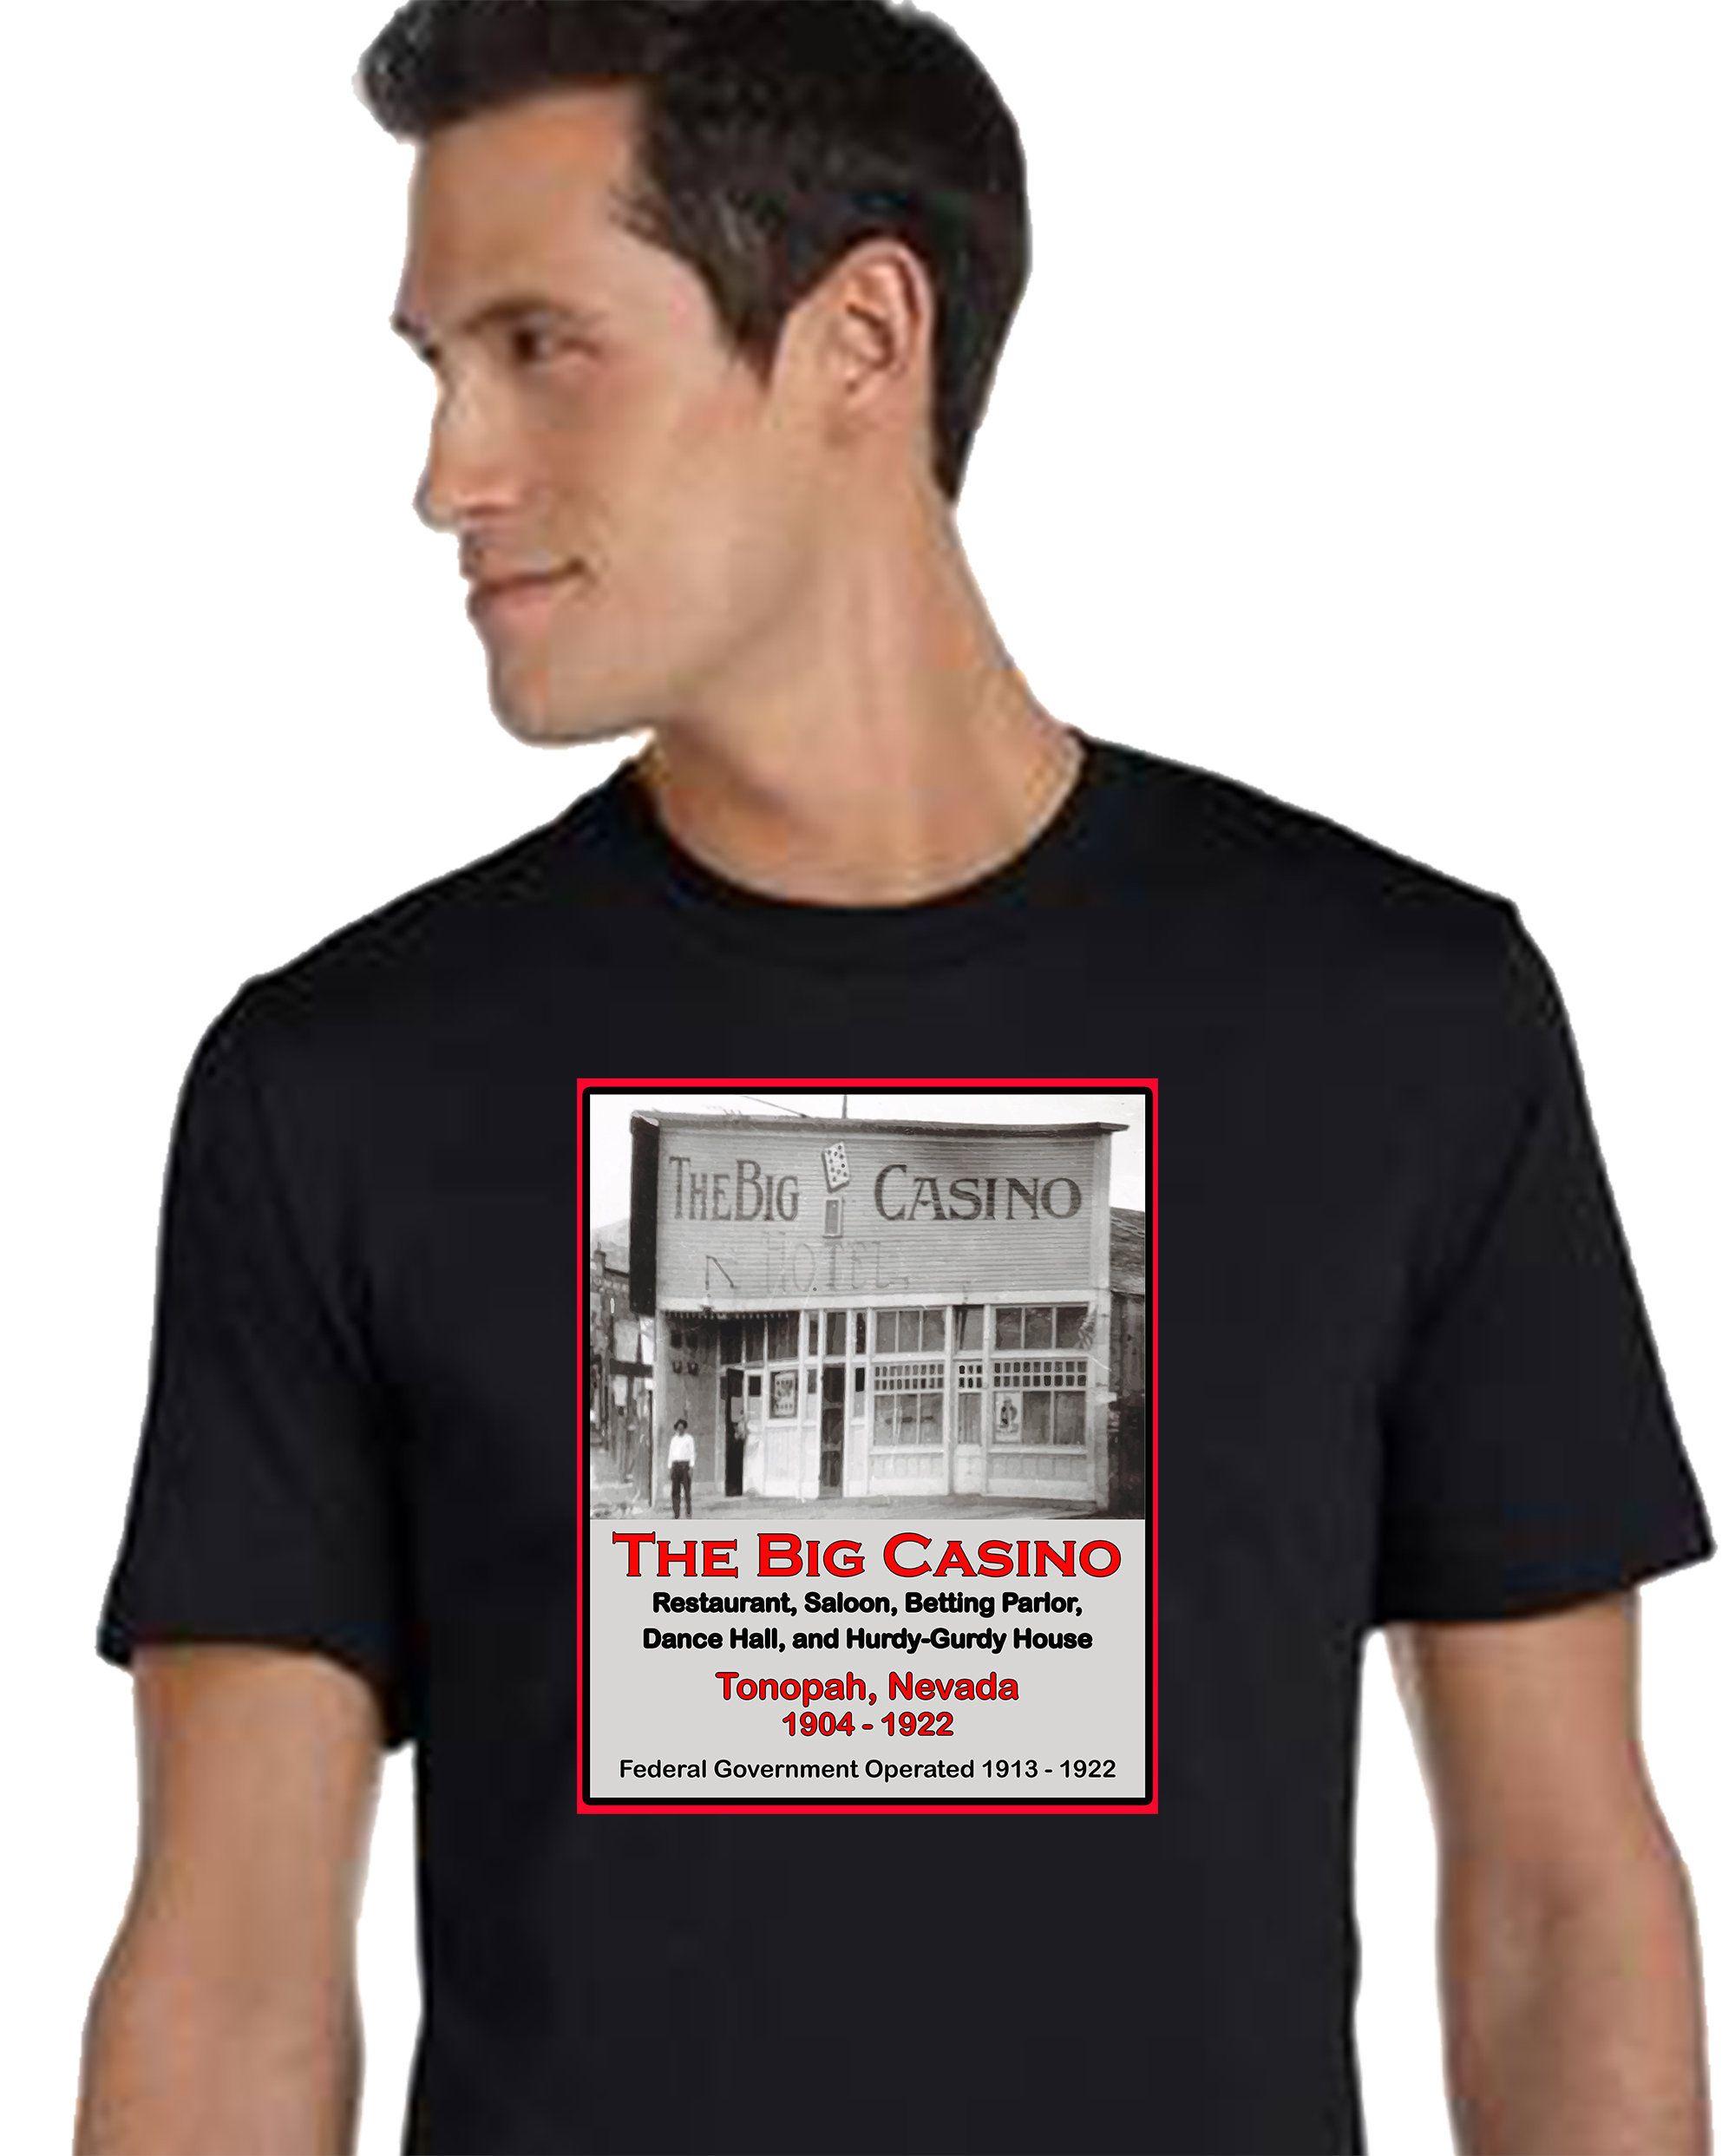 Vegas 24 casino nya betadonis